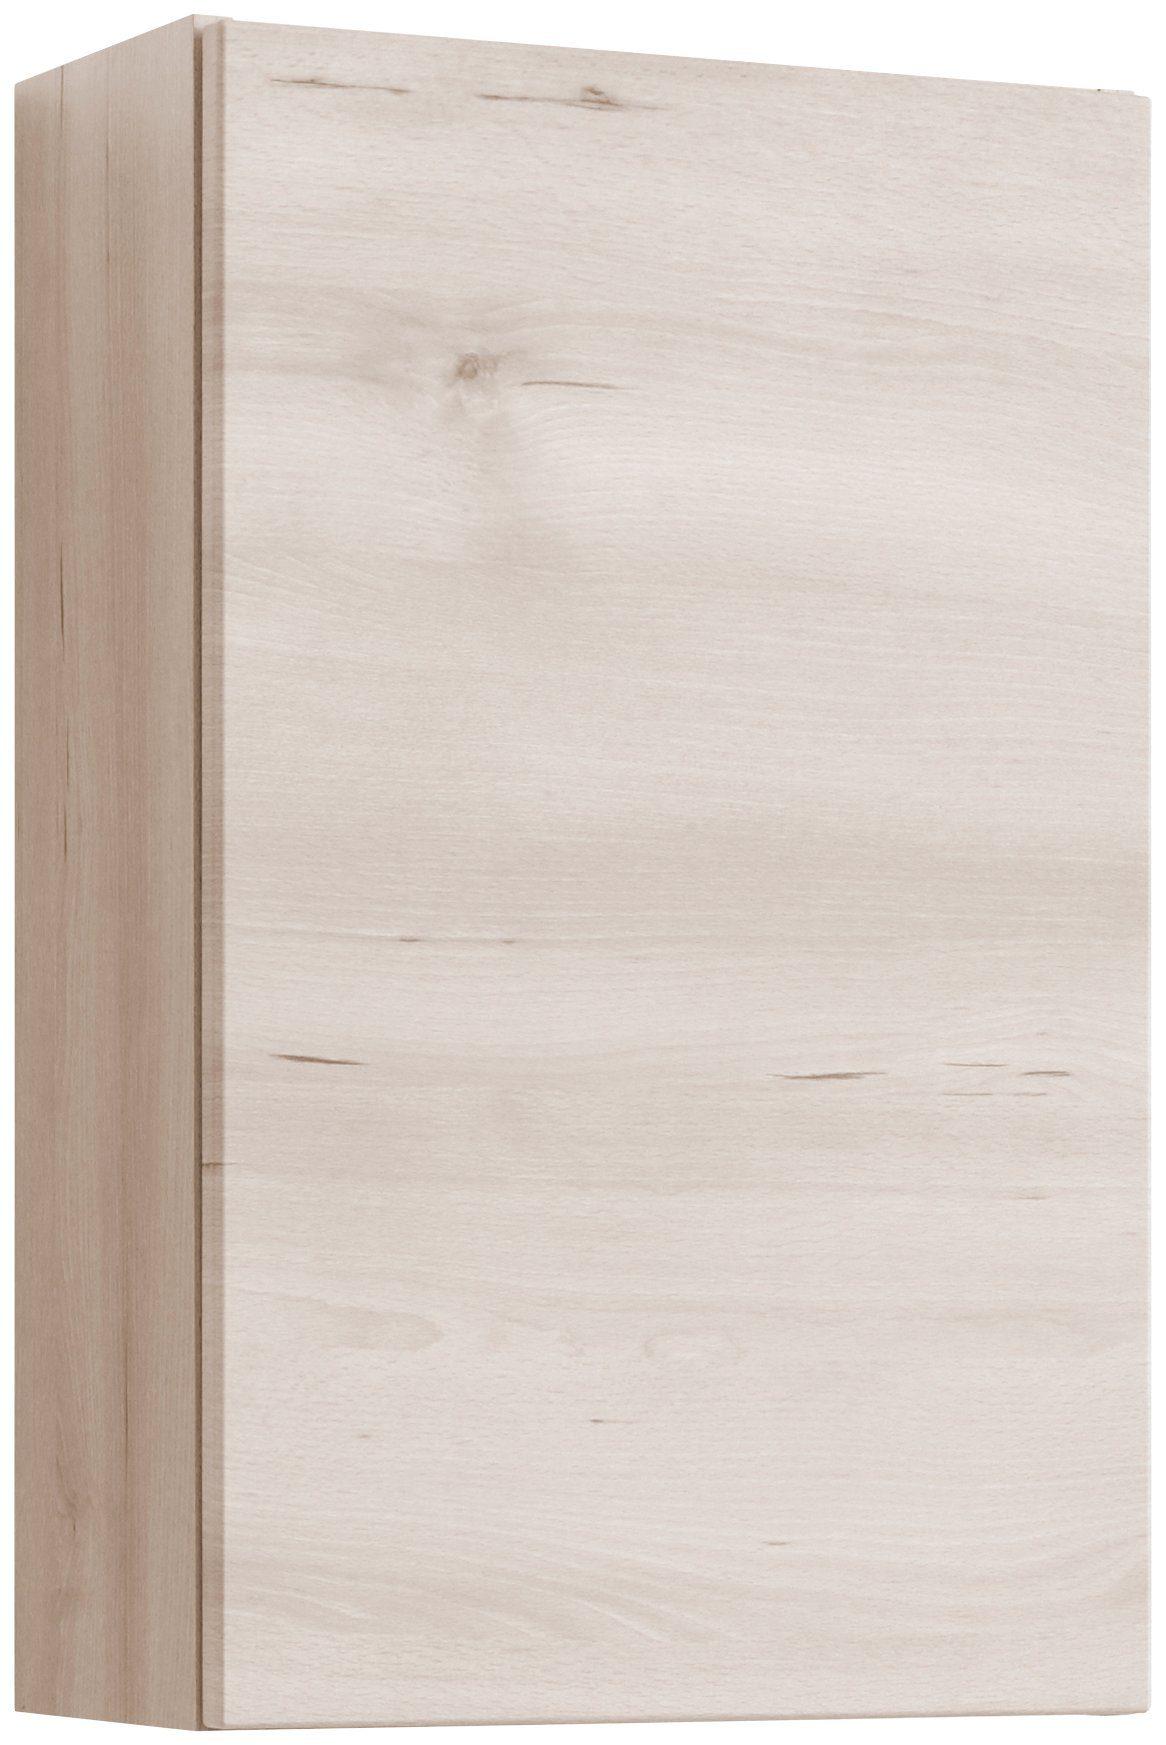 Held Möbel Hängeschrank »Belluno«, Breite 40 cm